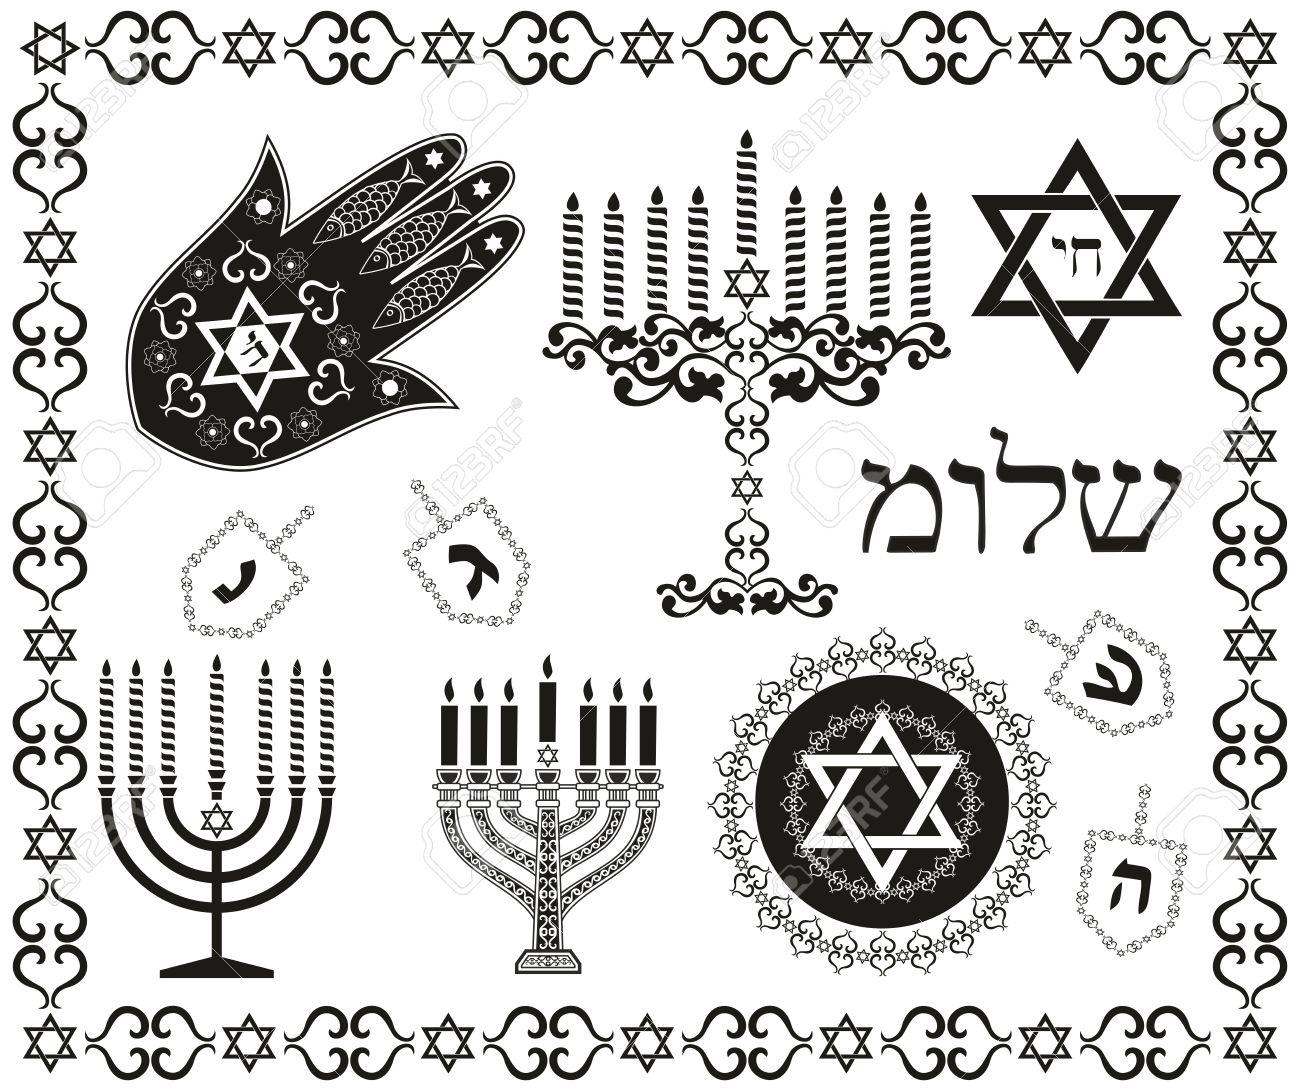 Set of jewish religious holiday symbols royalty free cliparts set of jewish religious holiday symbols stock vector 16294970 biocorpaavc